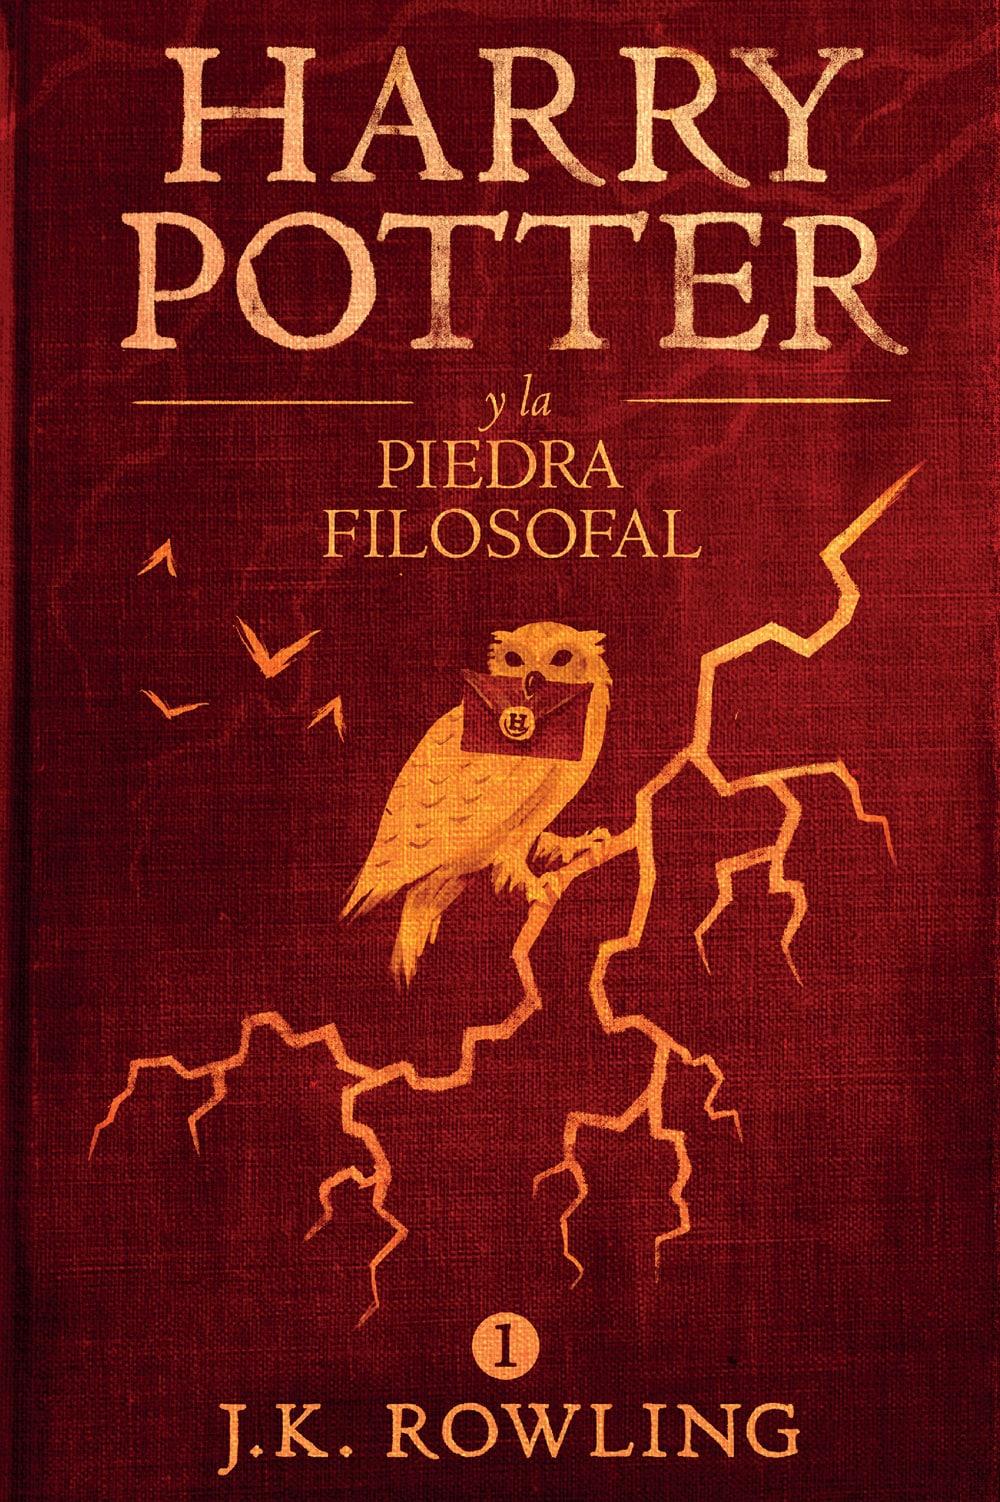 Libro Harry Potter, de J. K. Rowling